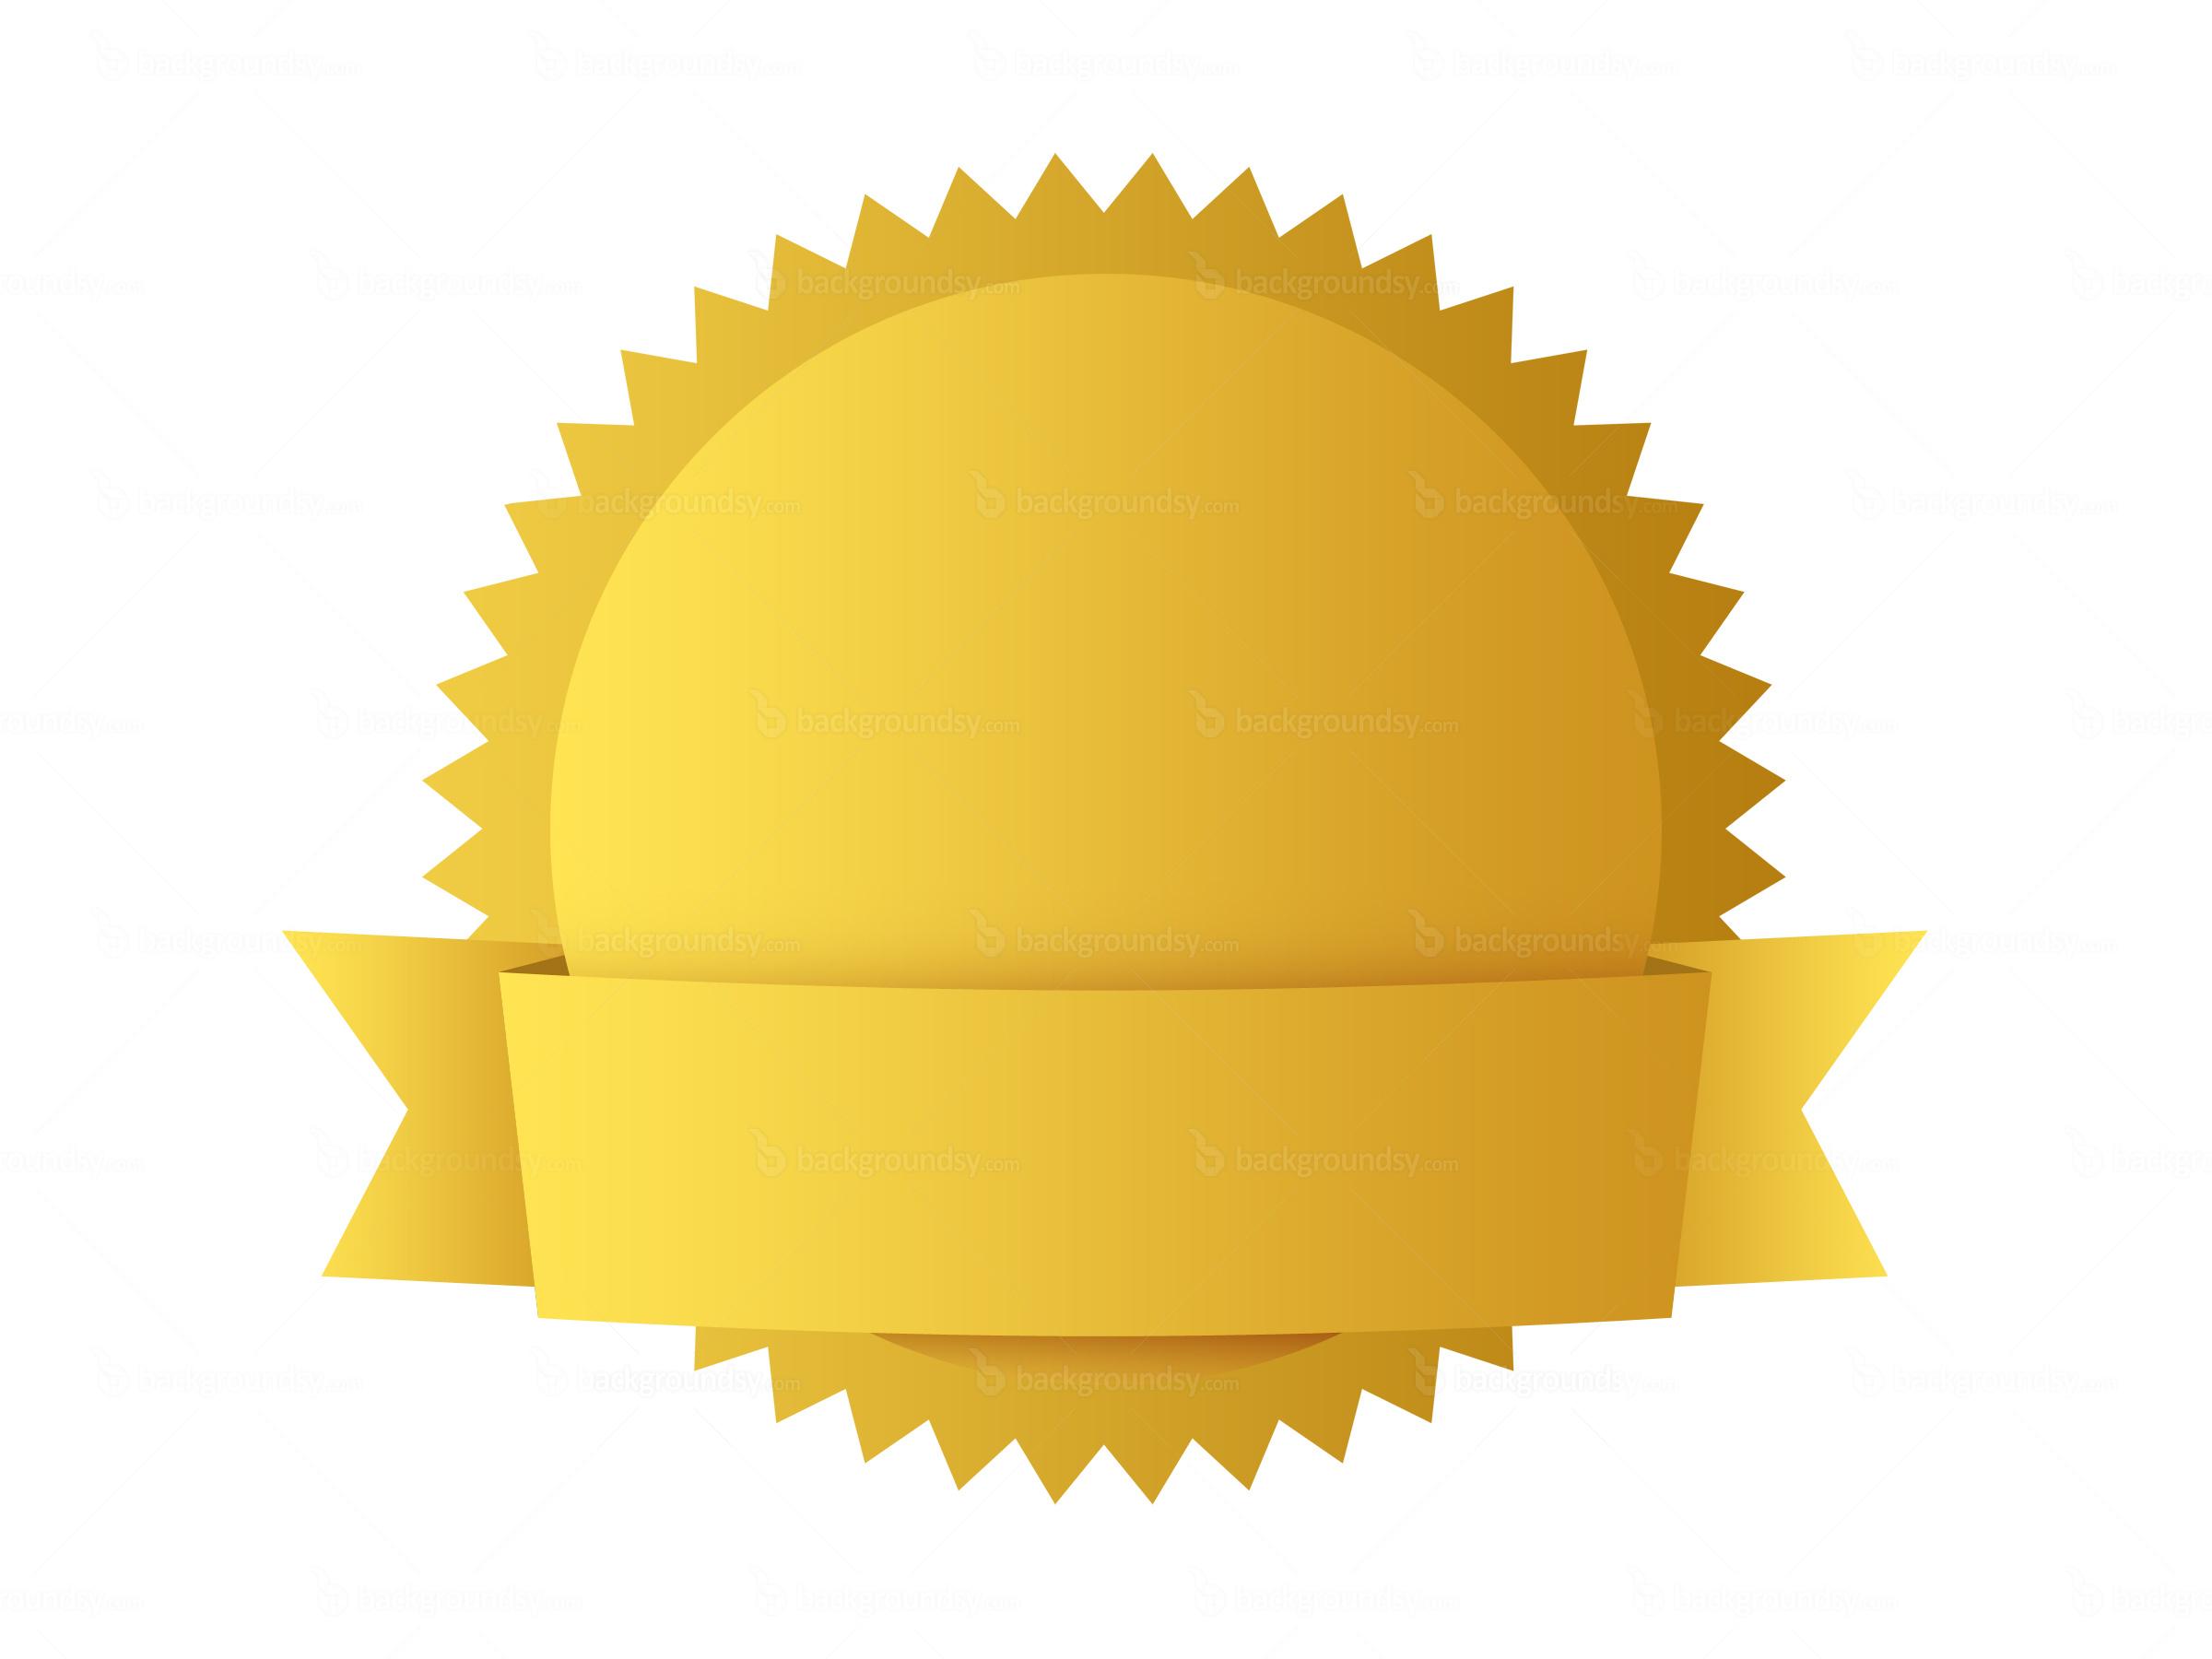 Free Award Clipart award seal, Download Free Clip Art on Owips.com.